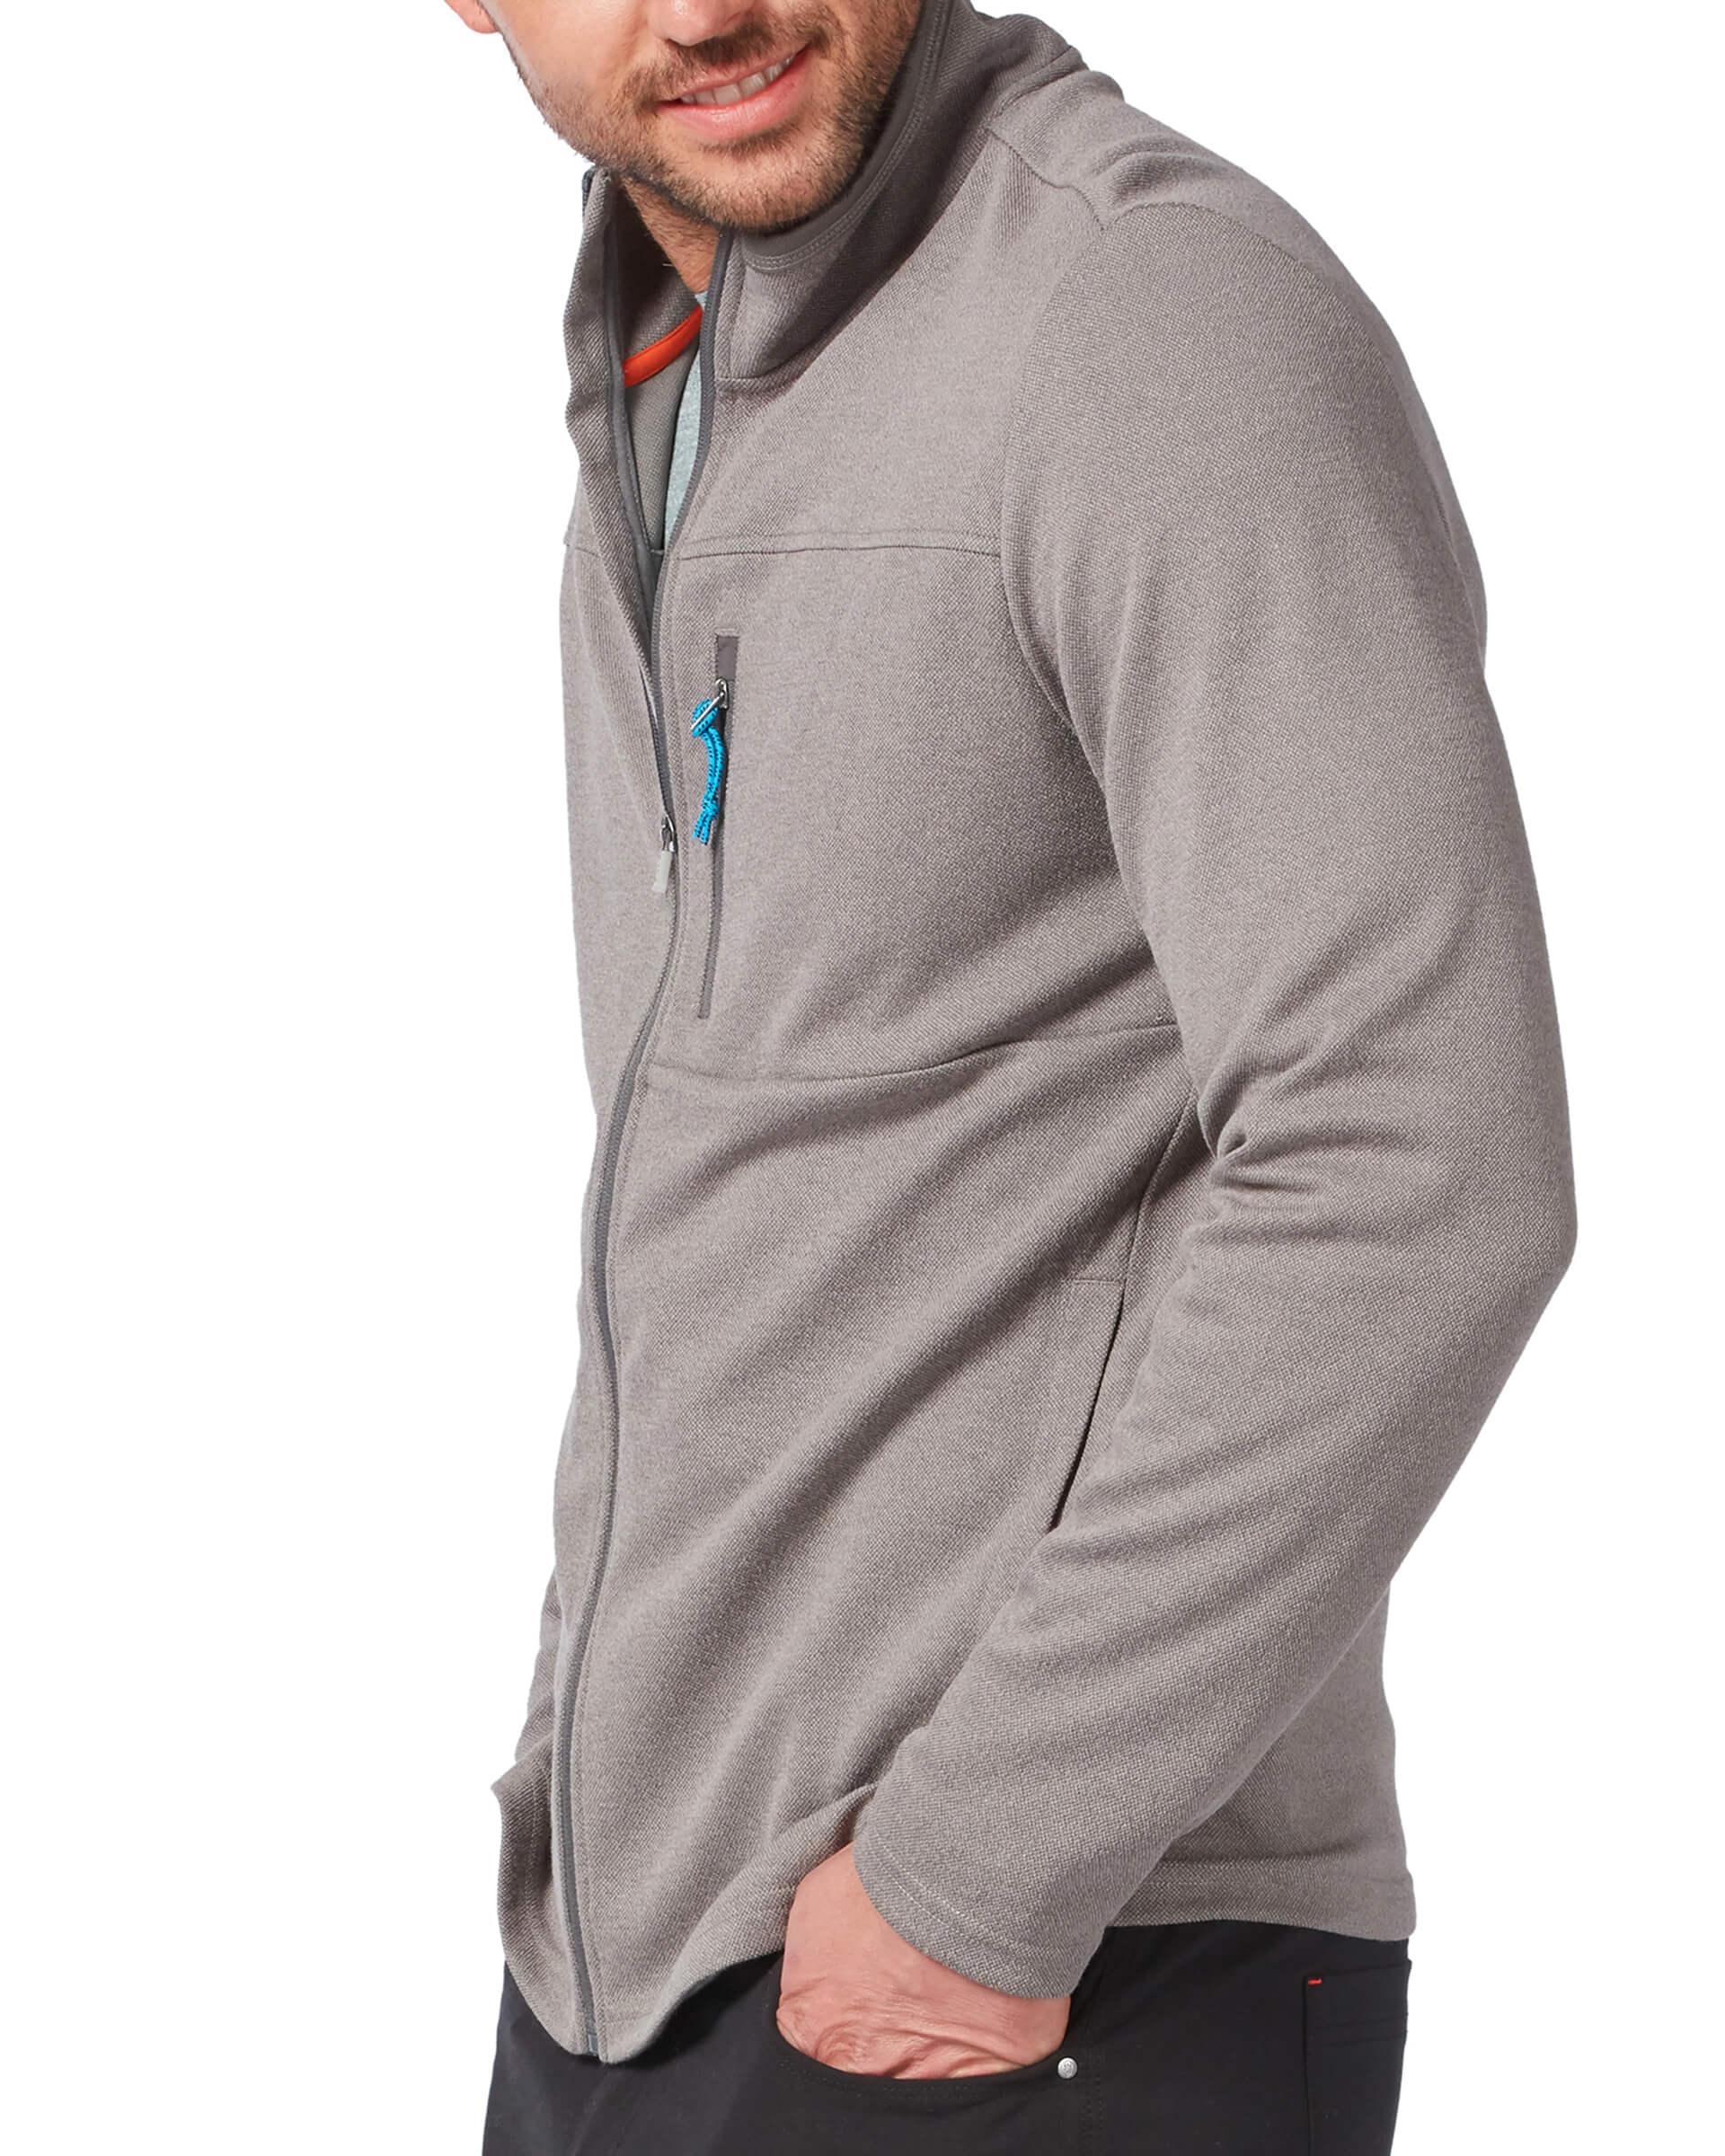 Men's FreeCycle® Double Knit Full Zip Fleece Jacket